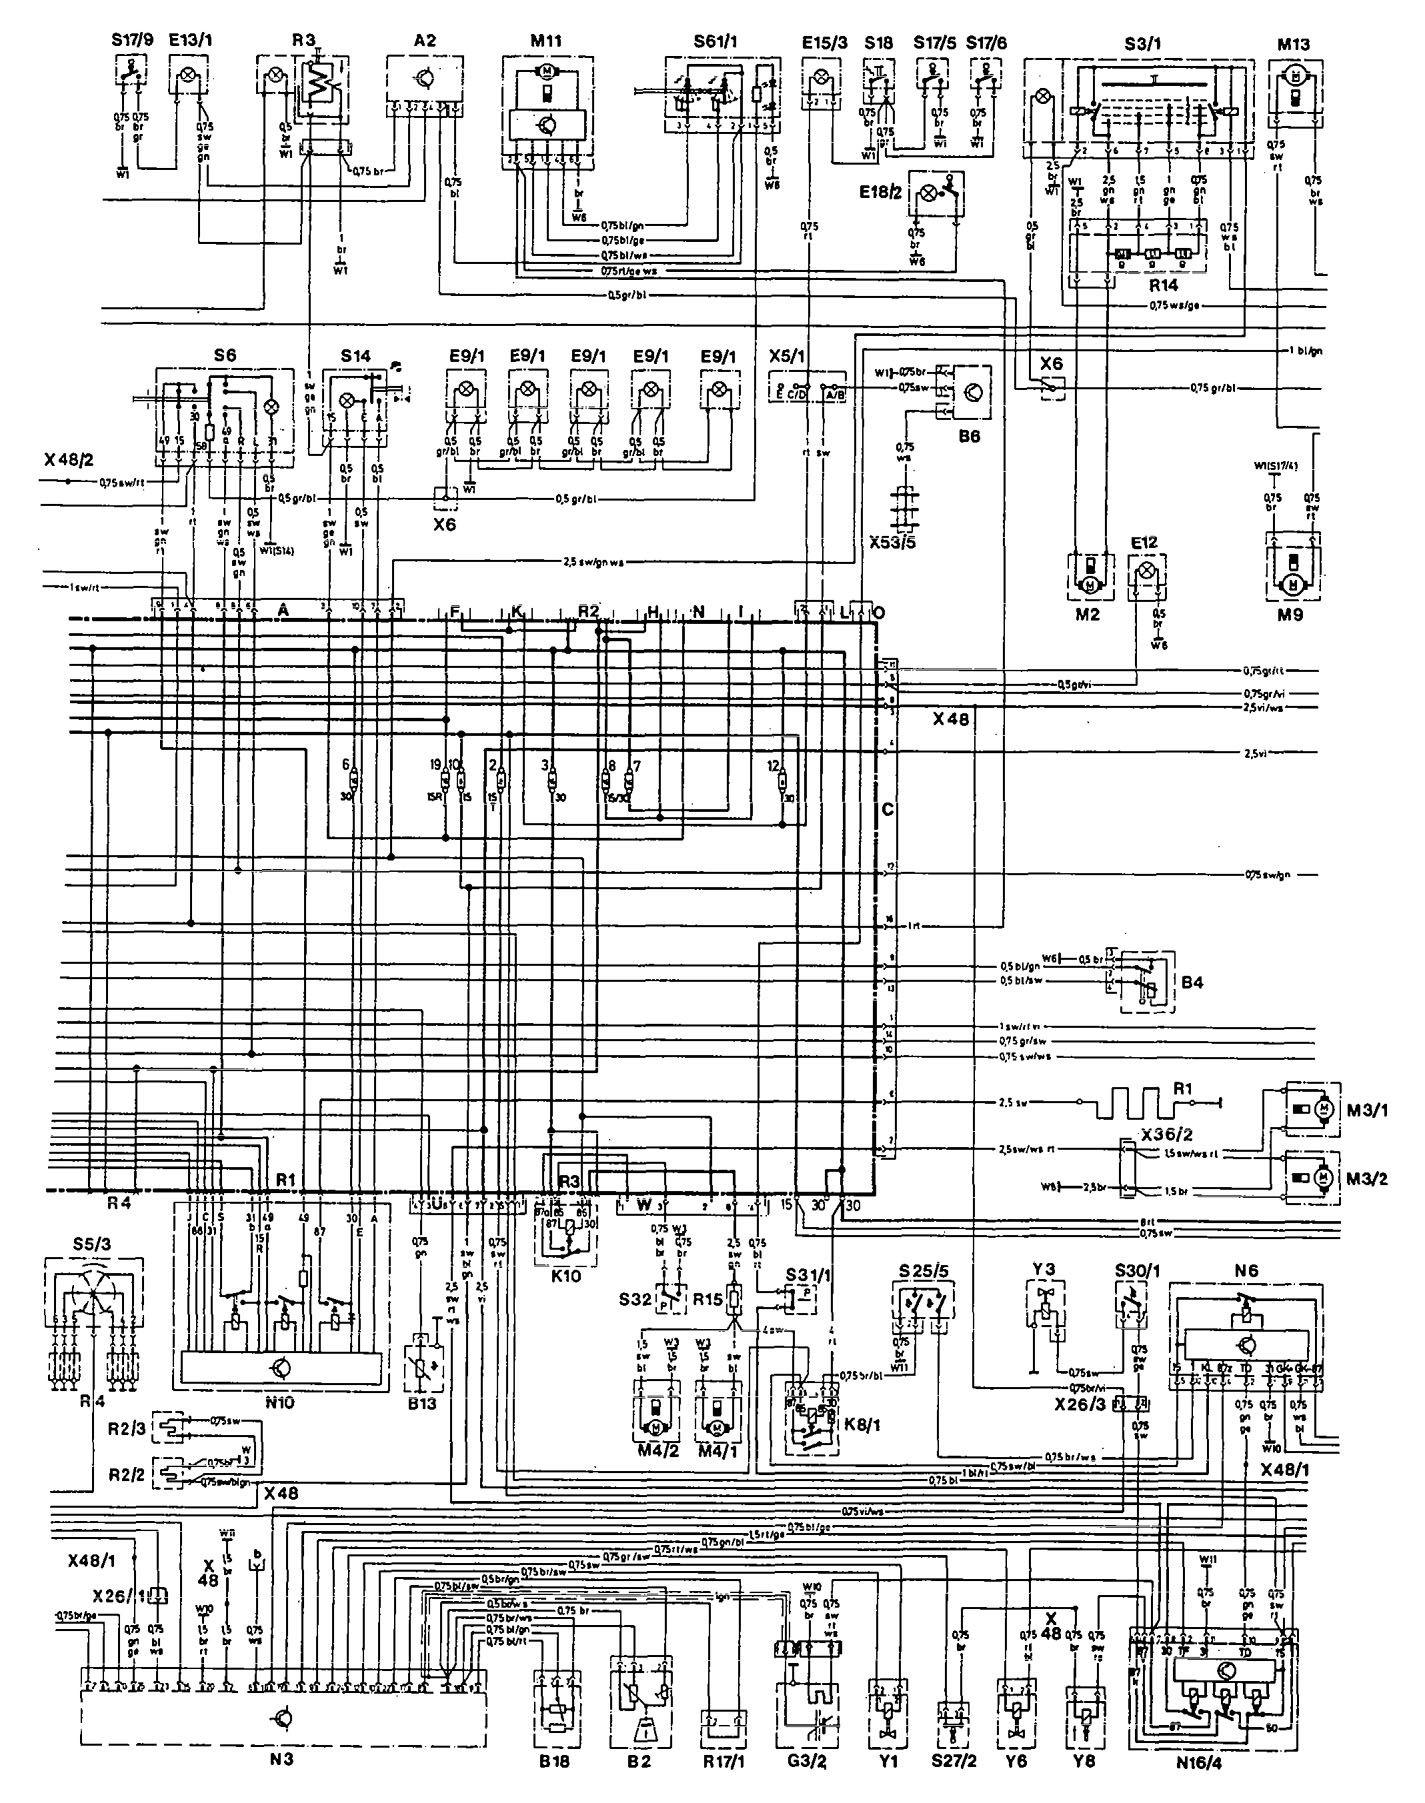 hight resolution of  dodge caravan wiring diagram on 93 geo metro wiring diagram 93 dodge daytona wiring diagram